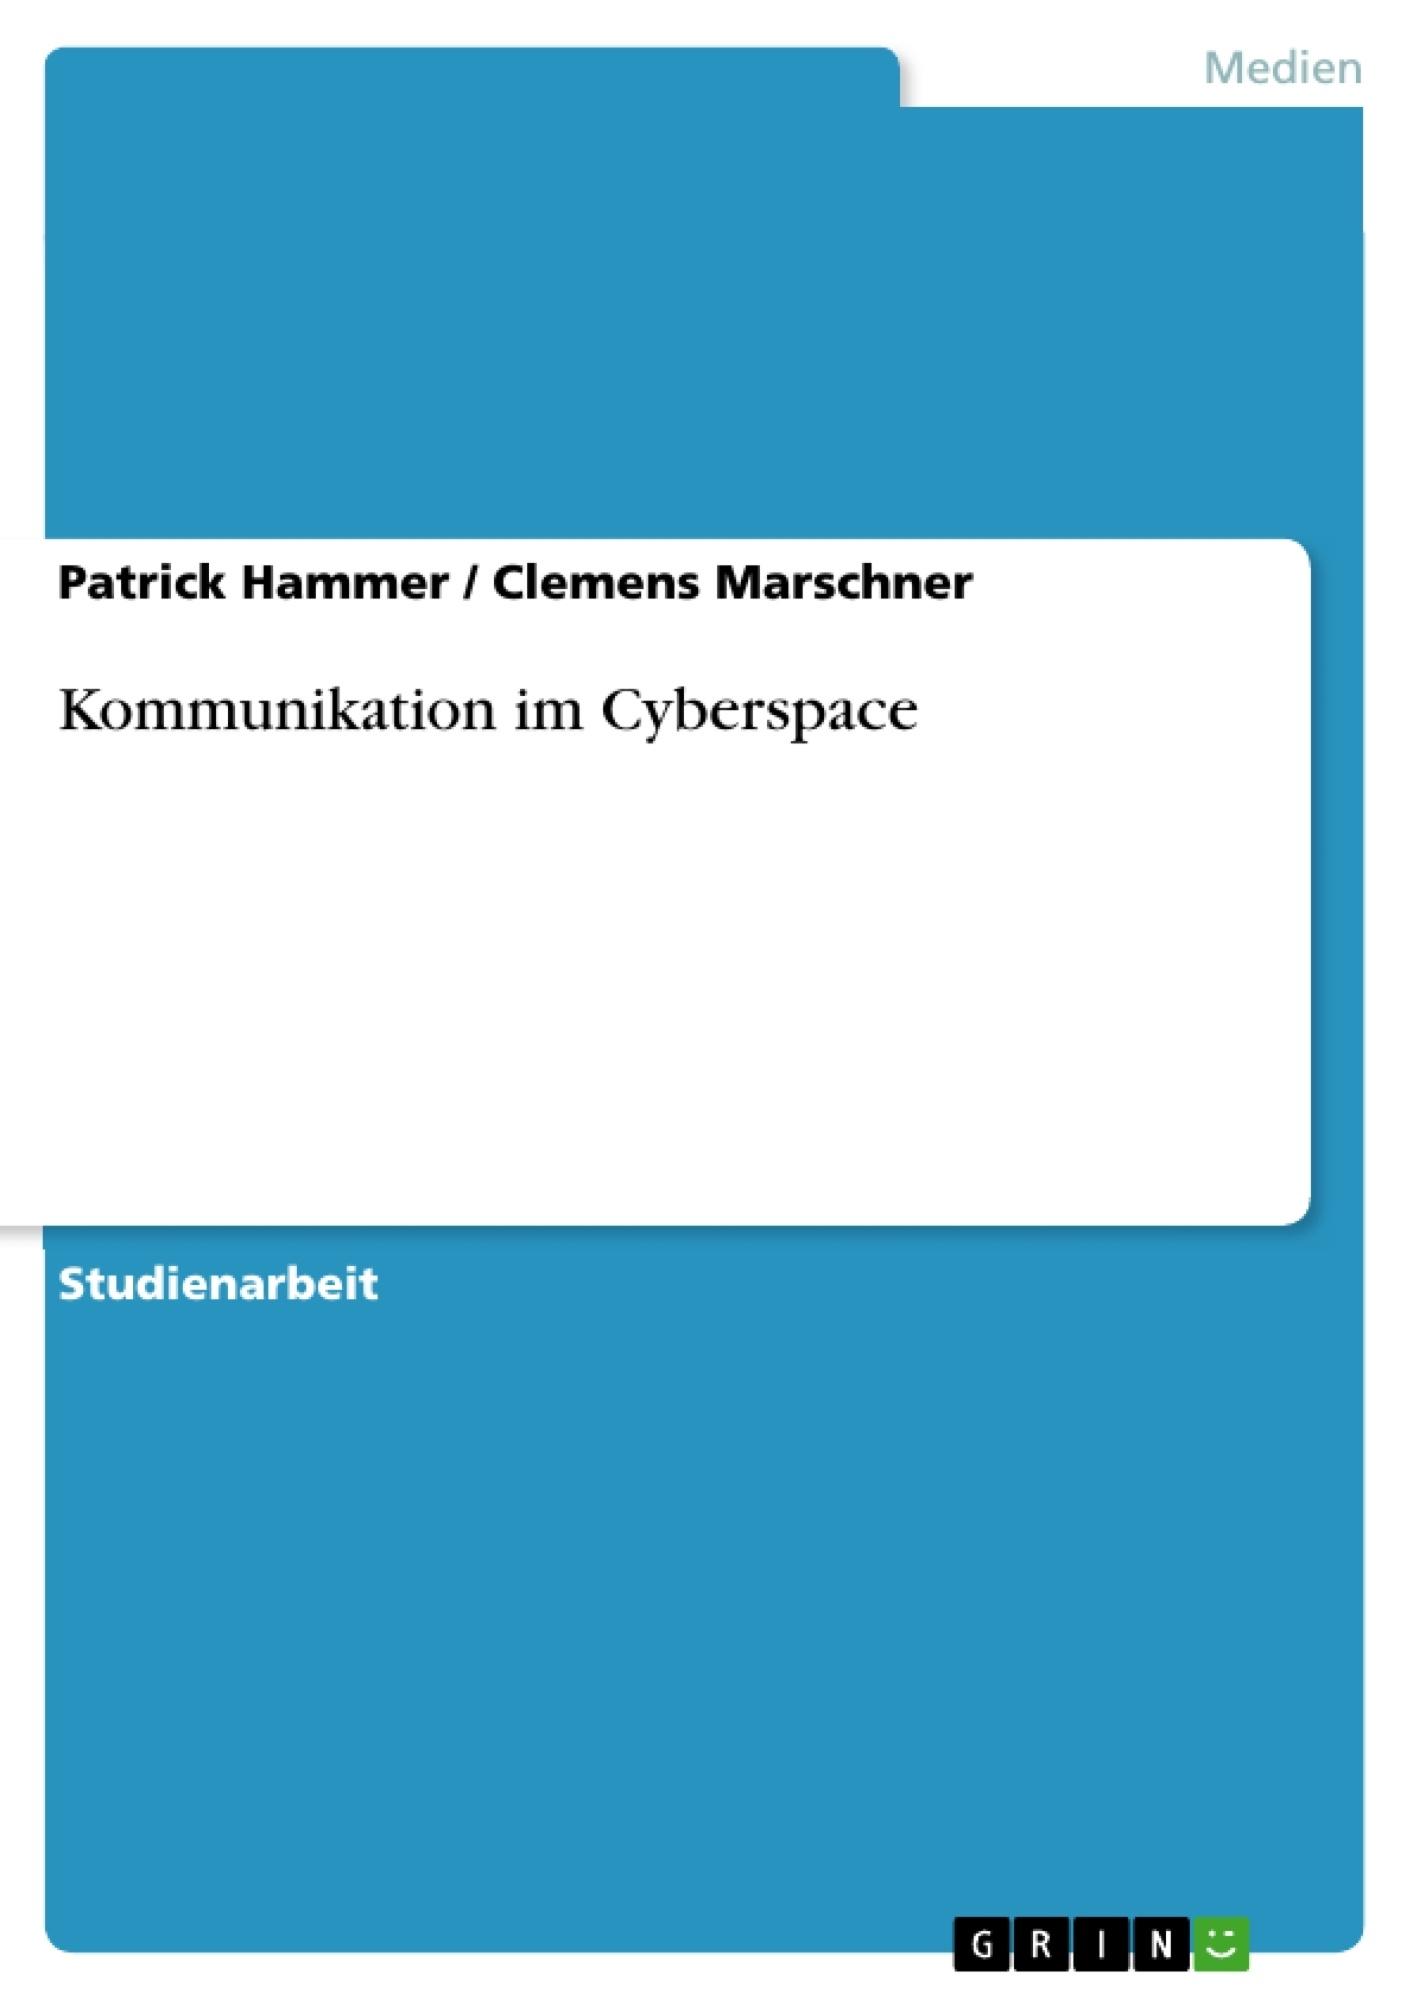 Titel: Kommunikation im Cyberspace